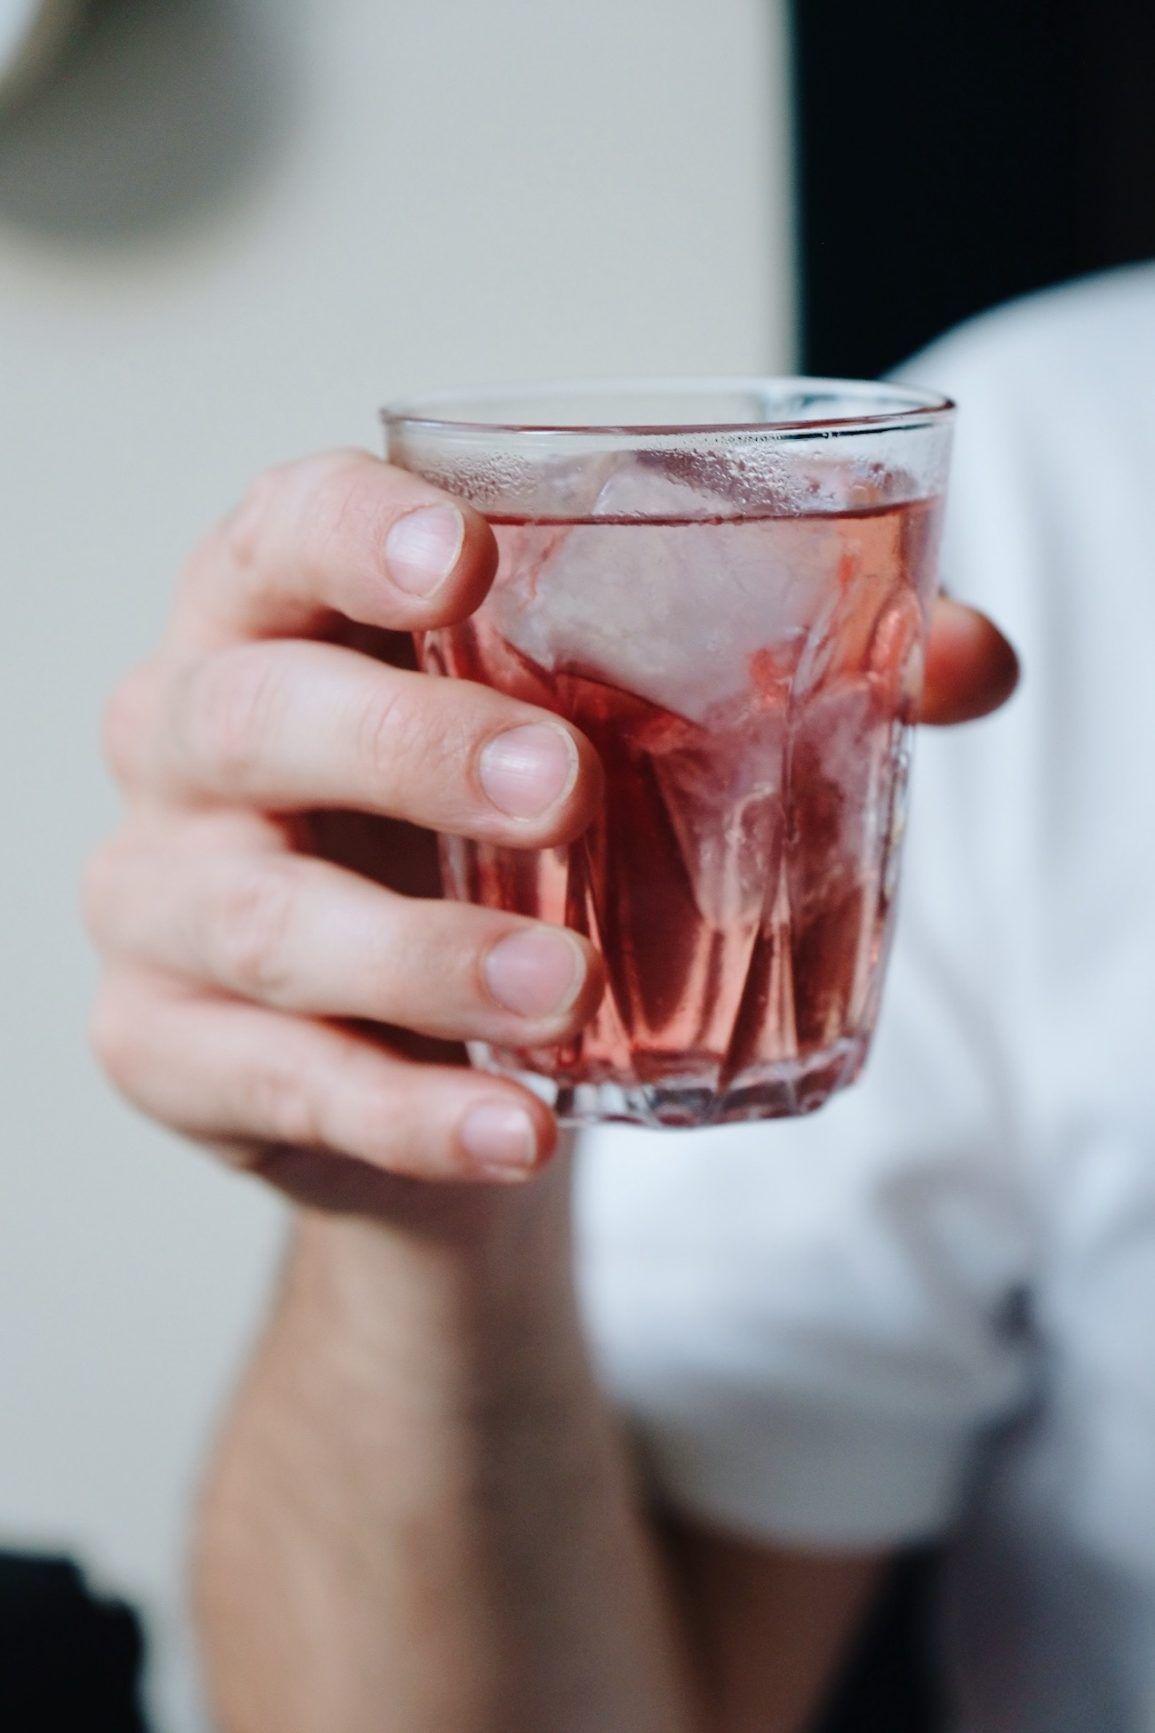 About Fuel, Foodblog, Leckerbissen, Bonvivant, Cocktail-Bistro, Drink